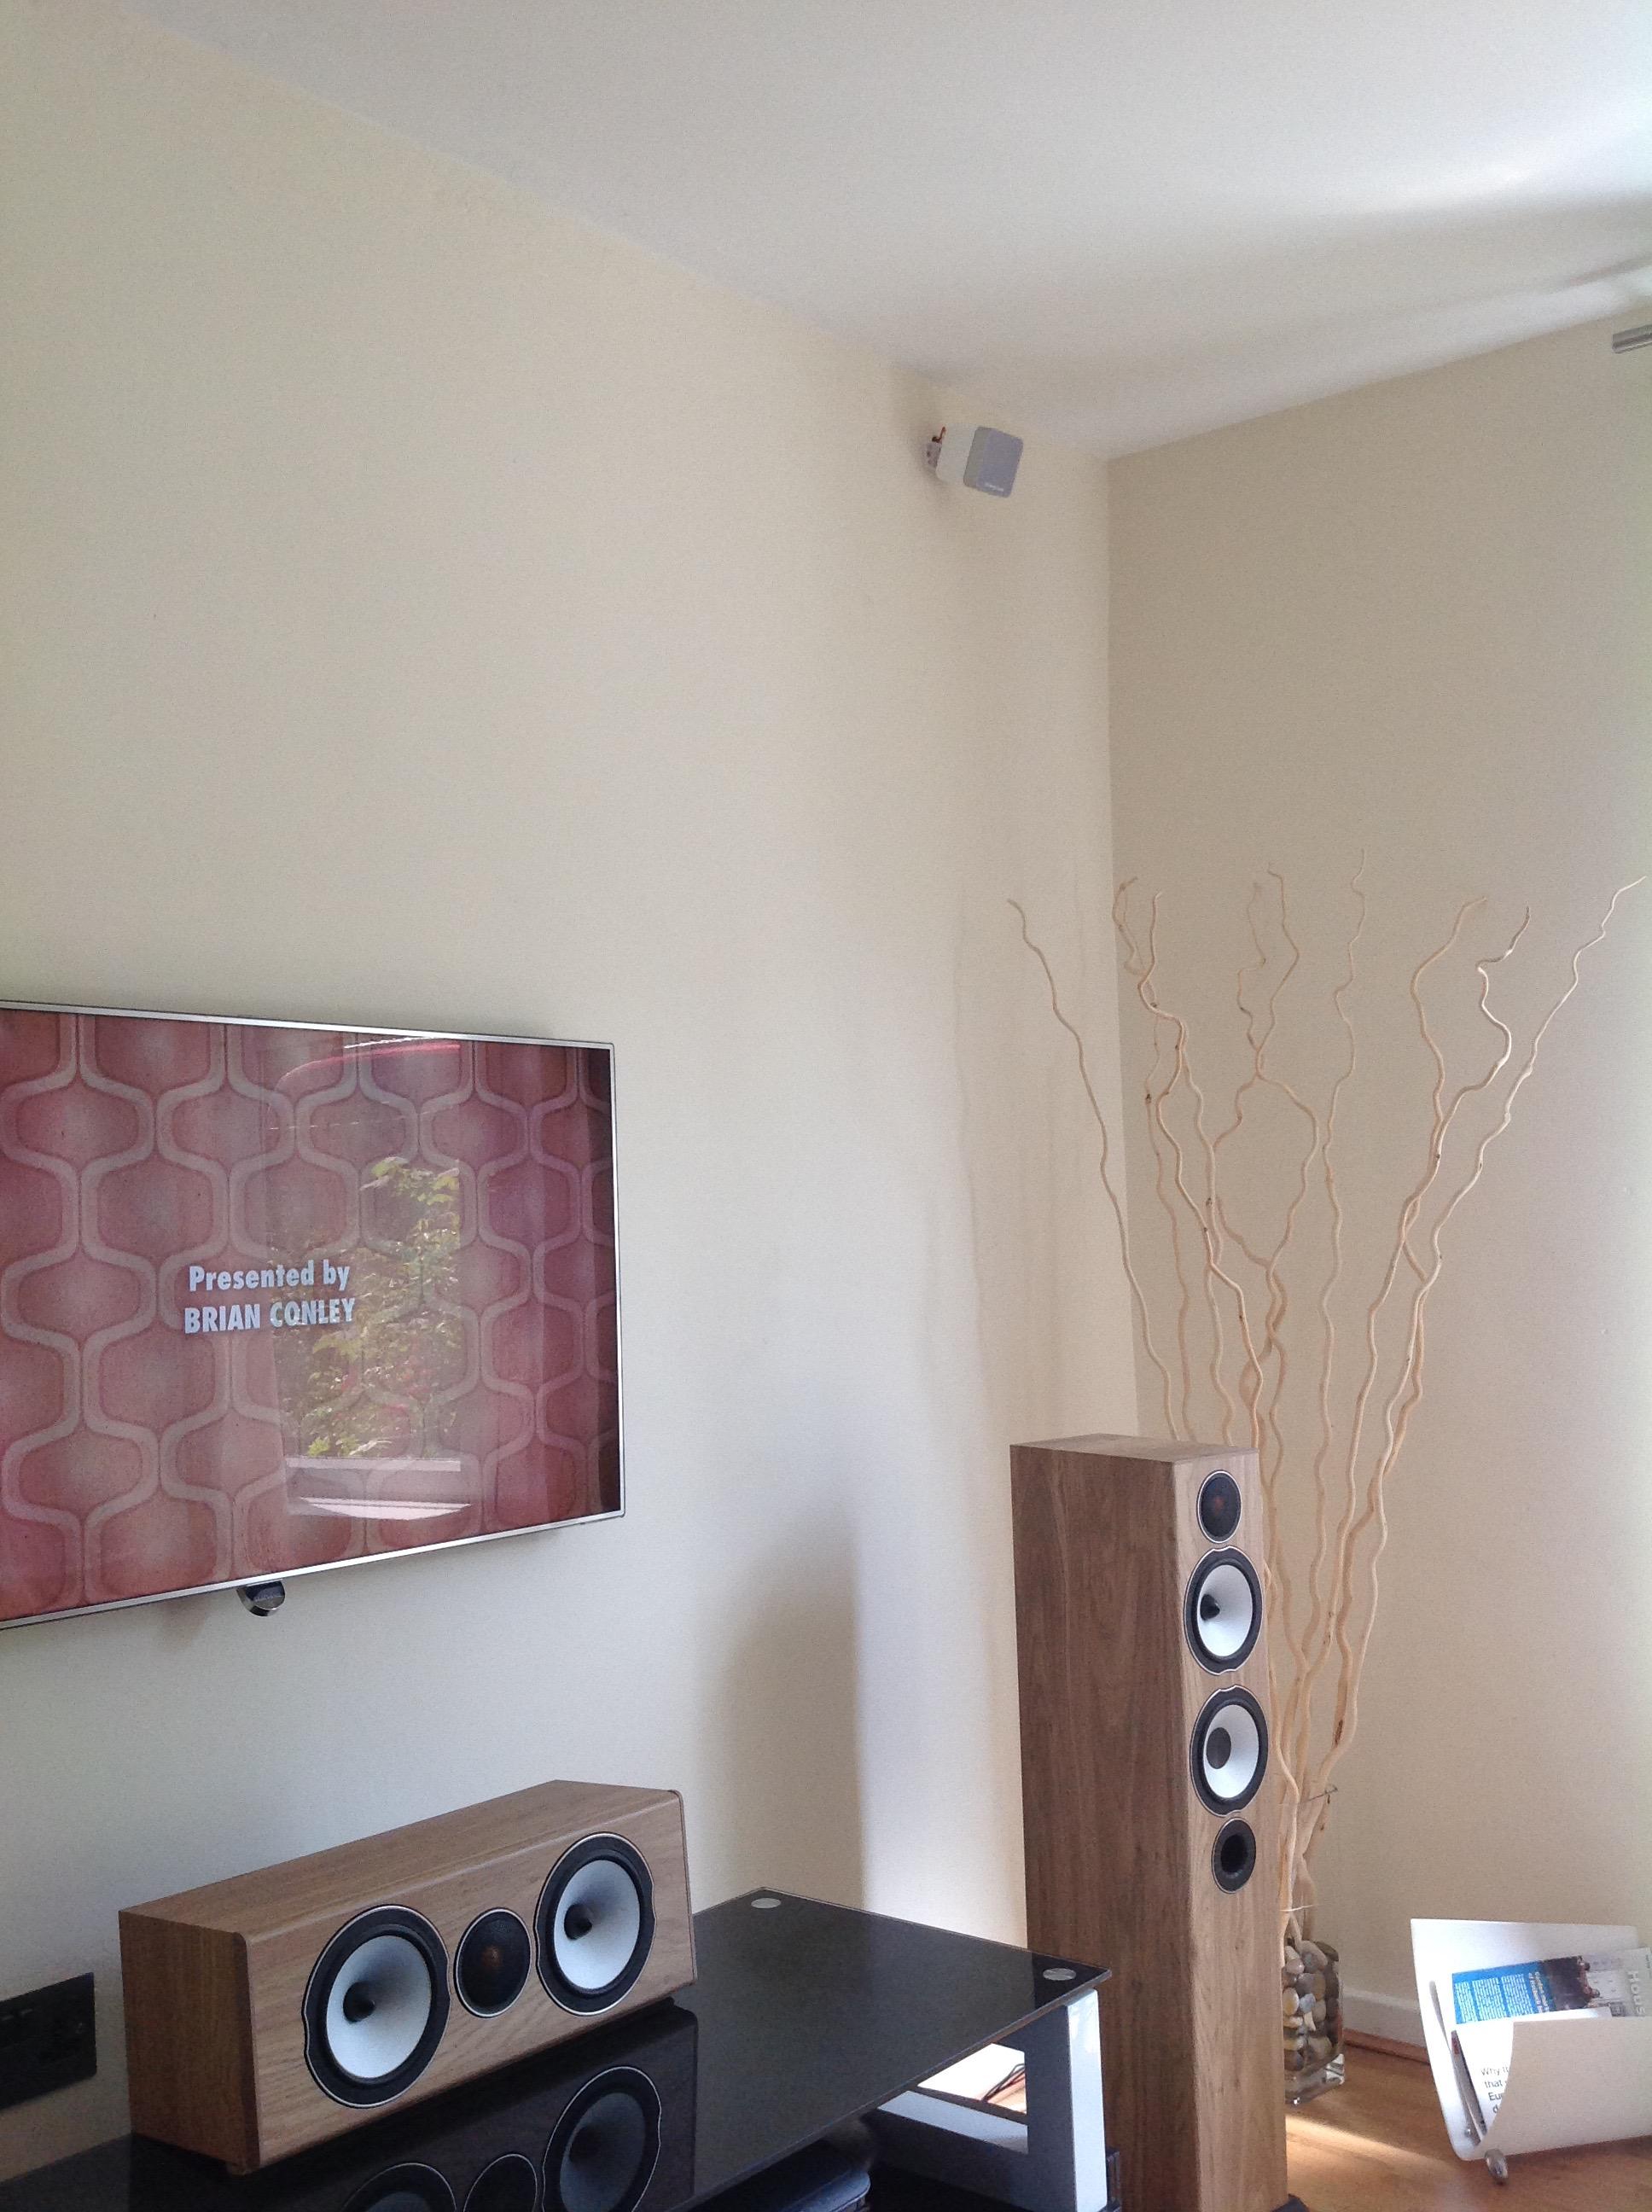 way senal ceiling b h speakers c pro premium csp system mount product pair reg speaker